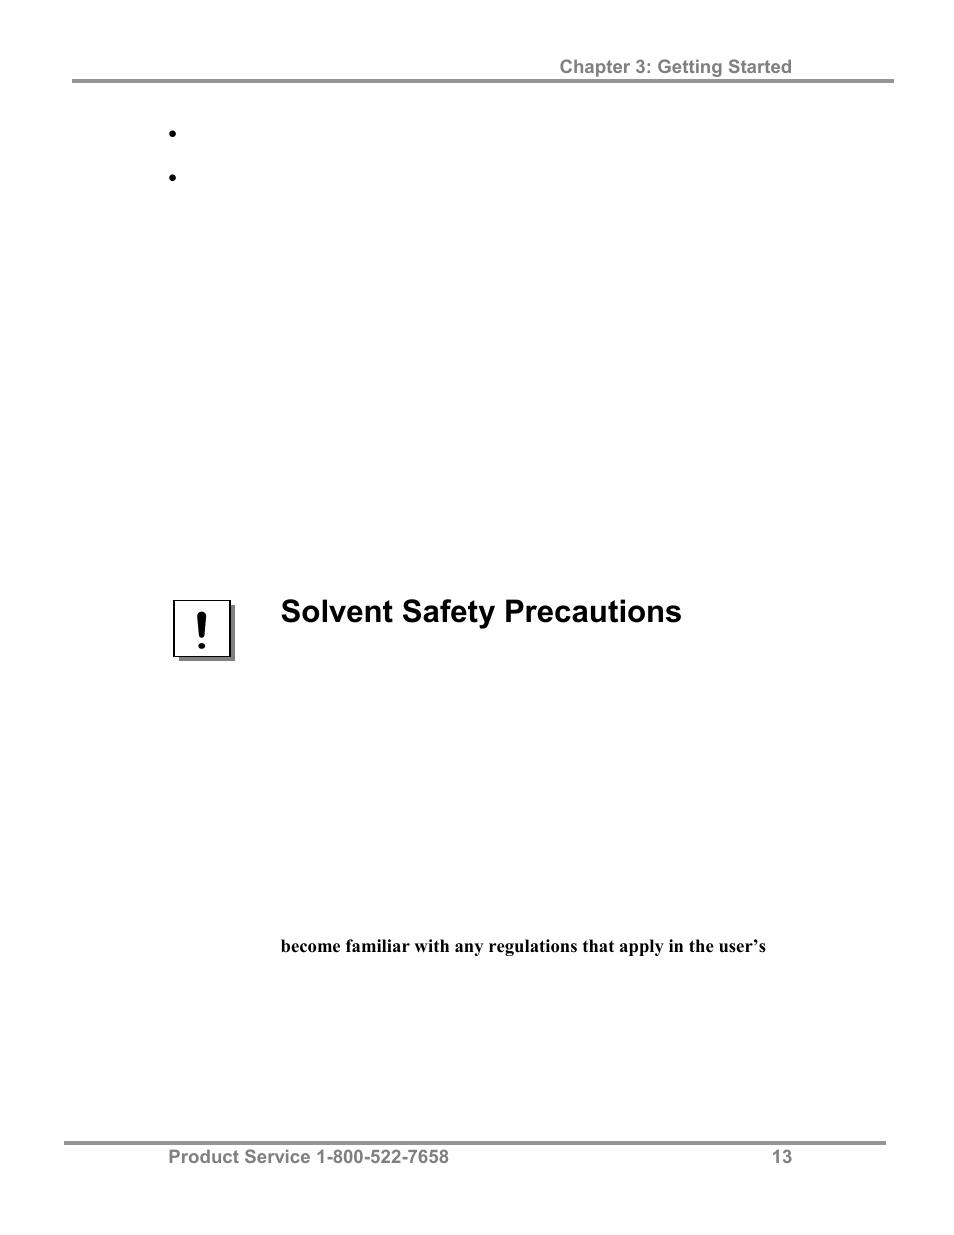 Solvent safety precautions | Labconco FreeZone 4 5 Liter